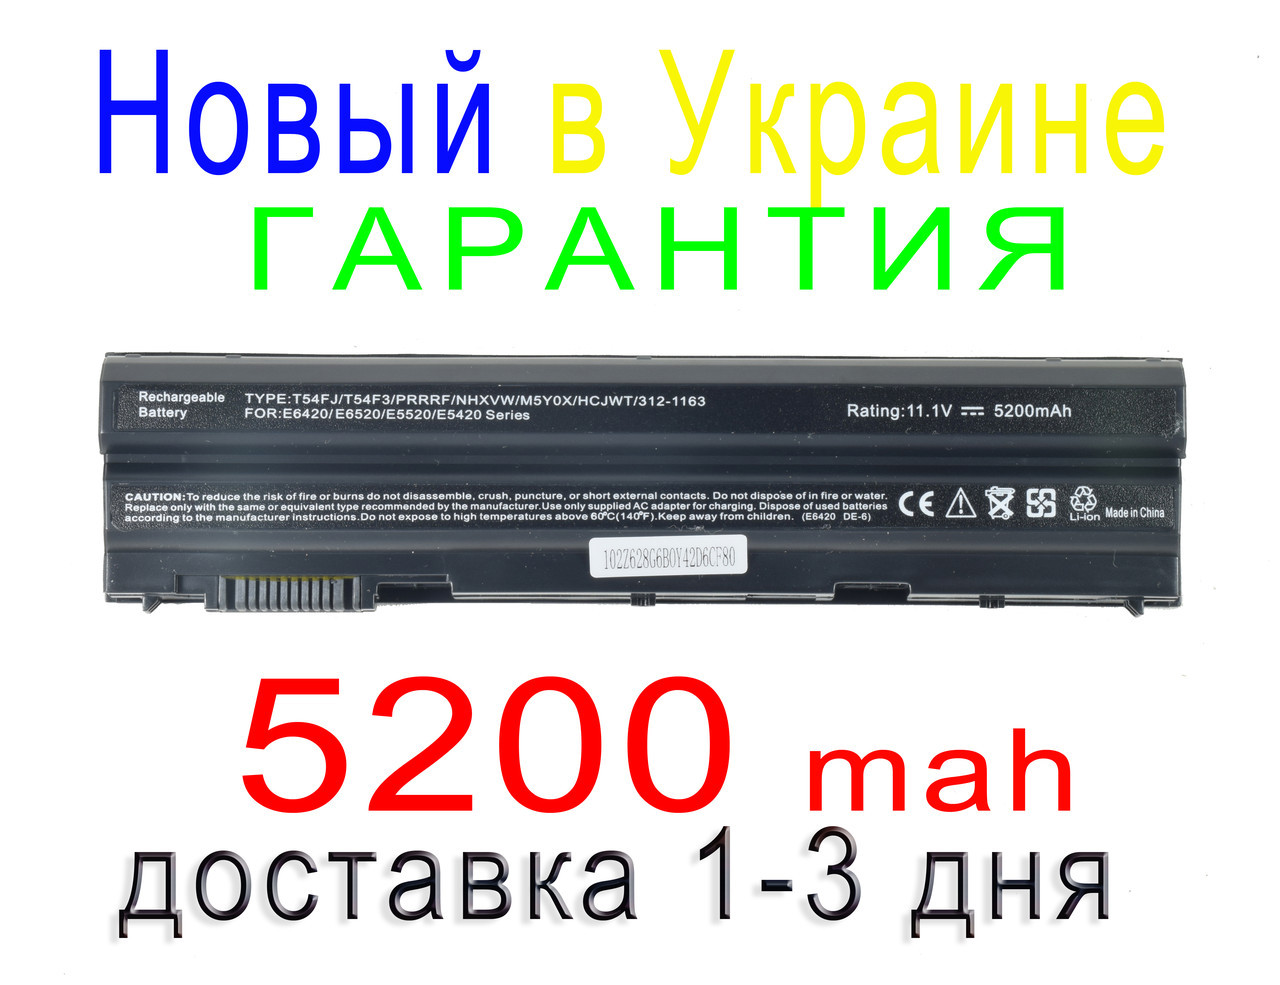 Аккумулятор батарея DELL Inspiron 17R 5720 17R 7720 17R SE 4720 17R SE 5720 17R SE 7720 17R TURBO